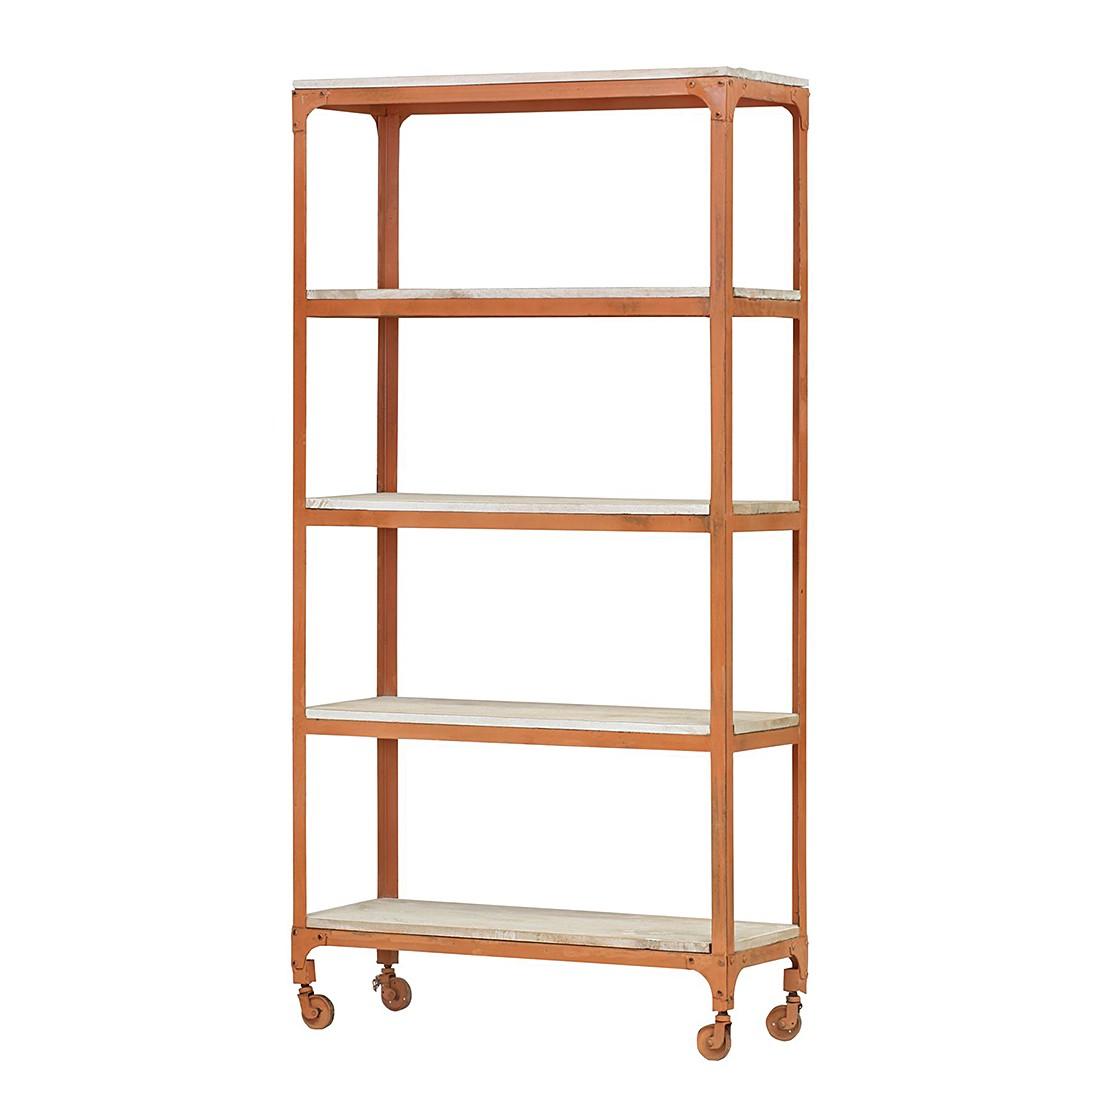 metallregal storm orange lackiert mit 5 b den. Black Bedroom Furniture Sets. Home Design Ideas